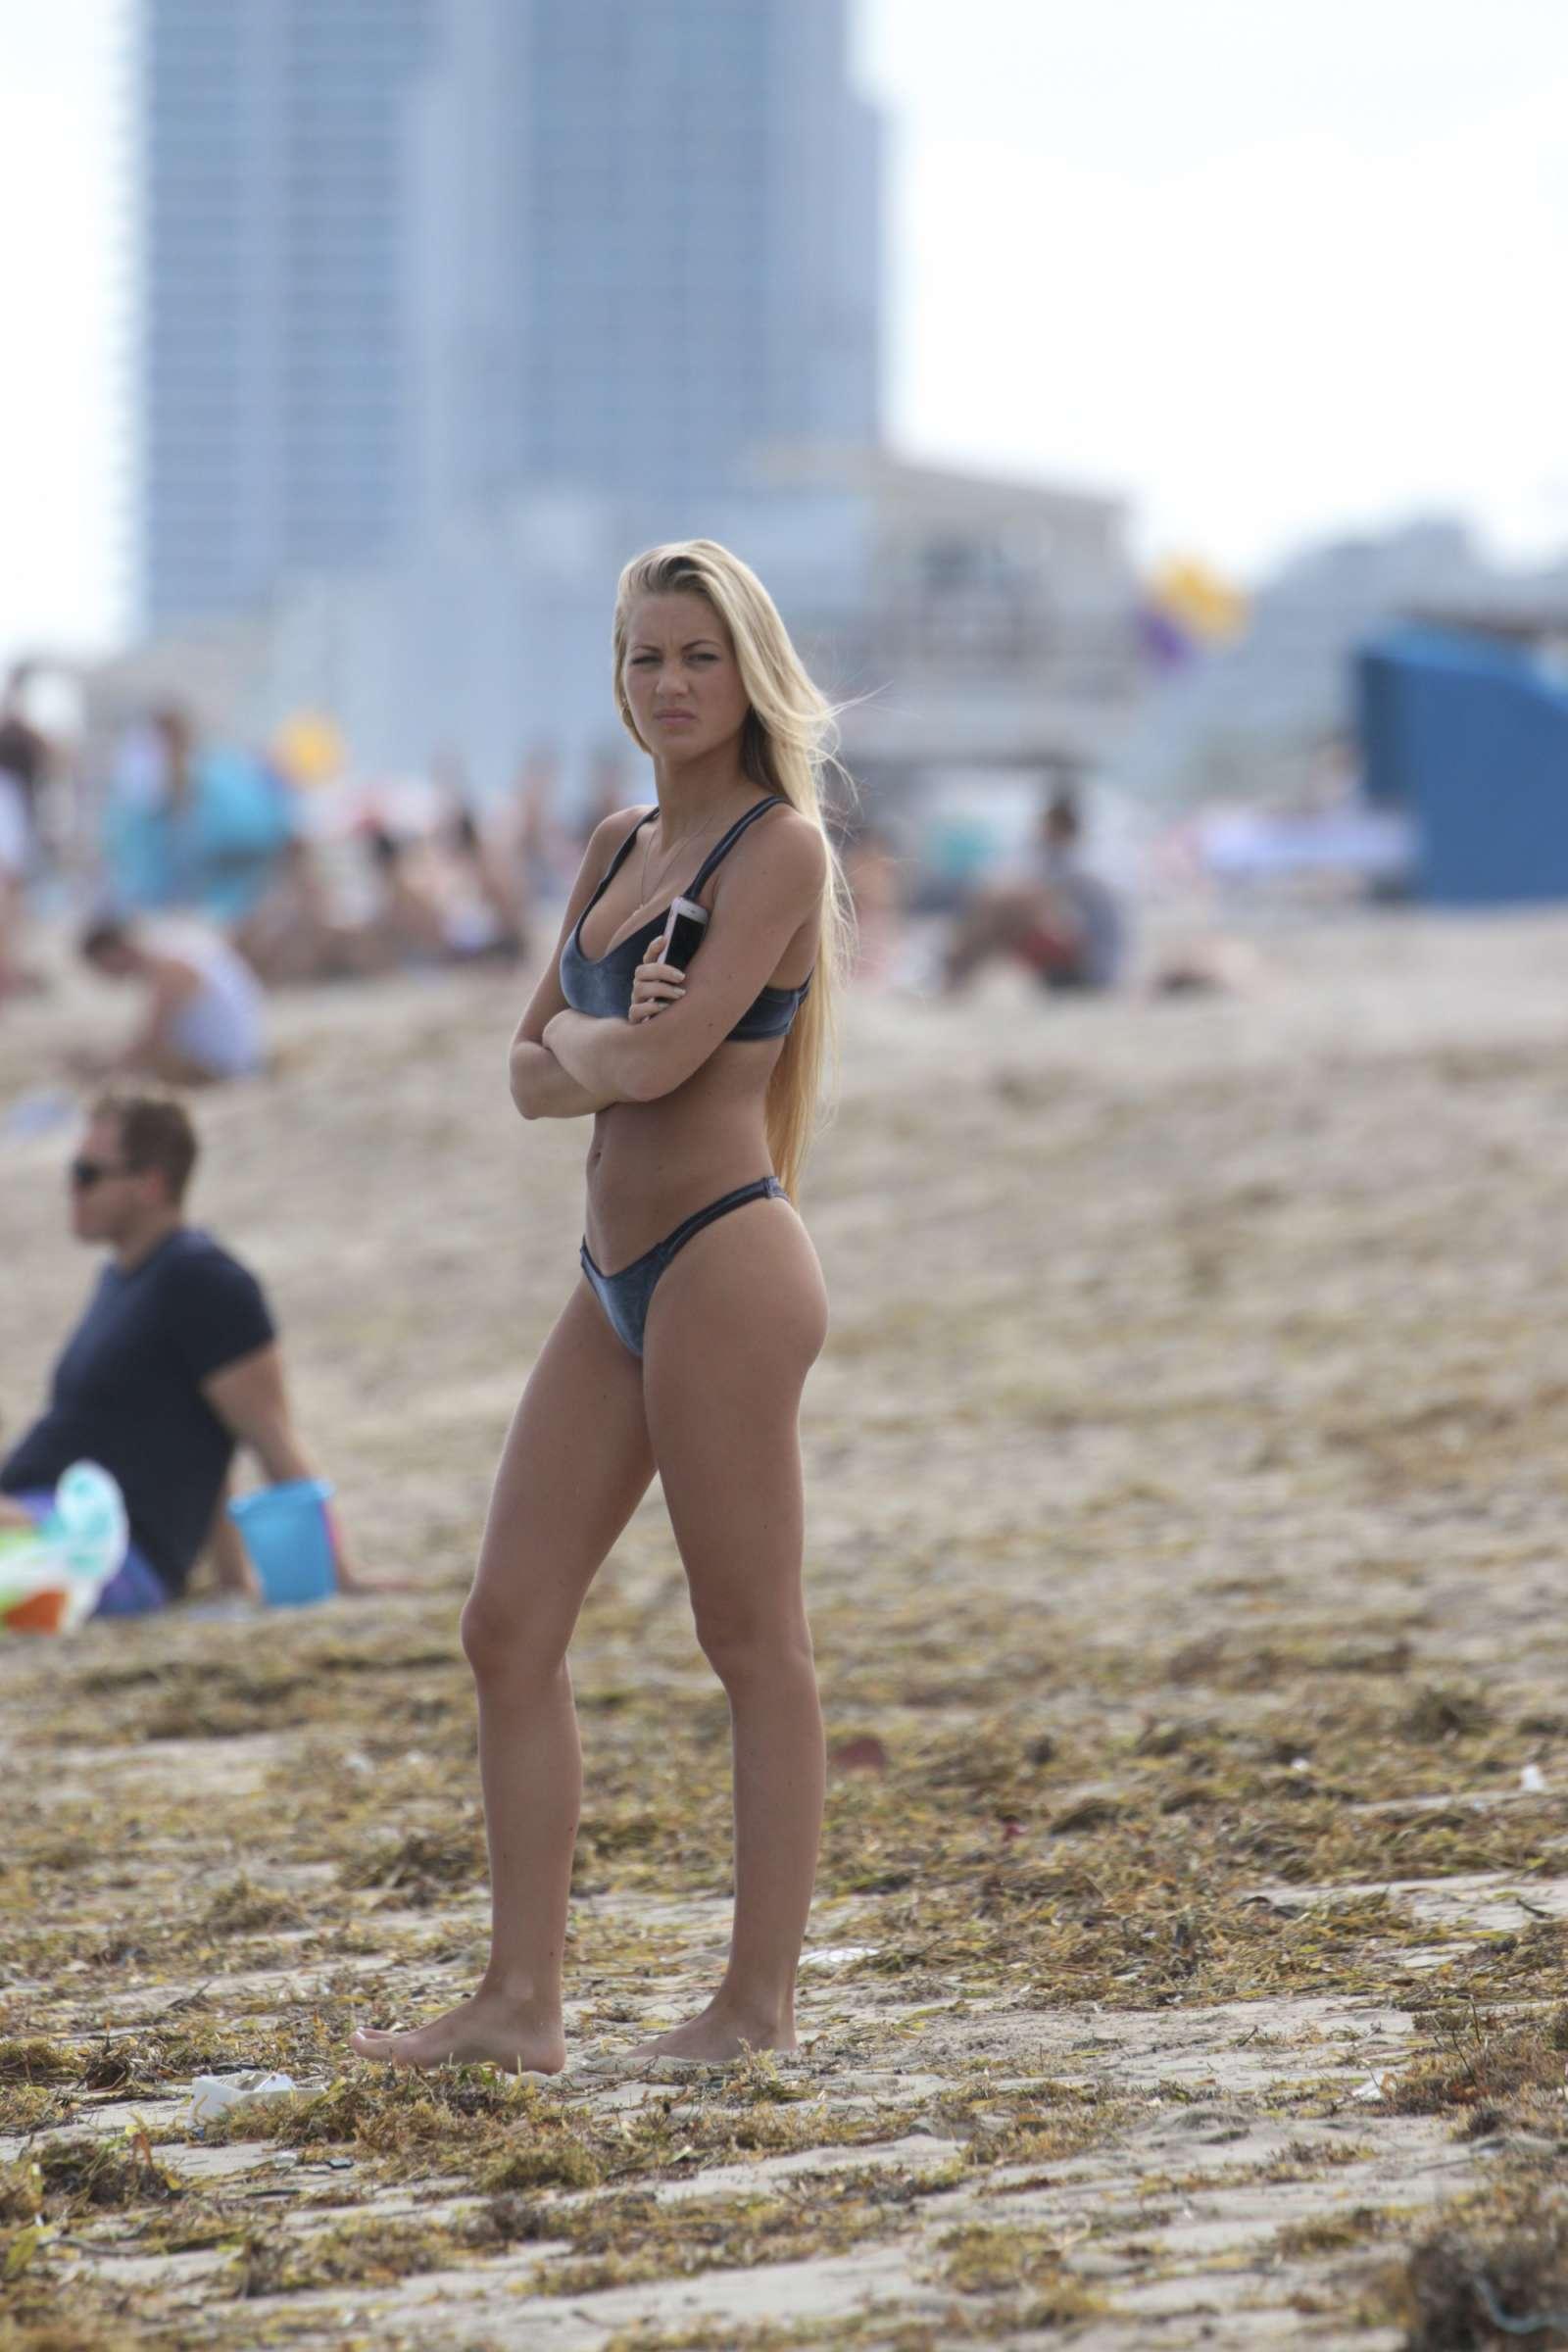 Hot Ludmila Isabella Bikini Photos - Barnorama-8354